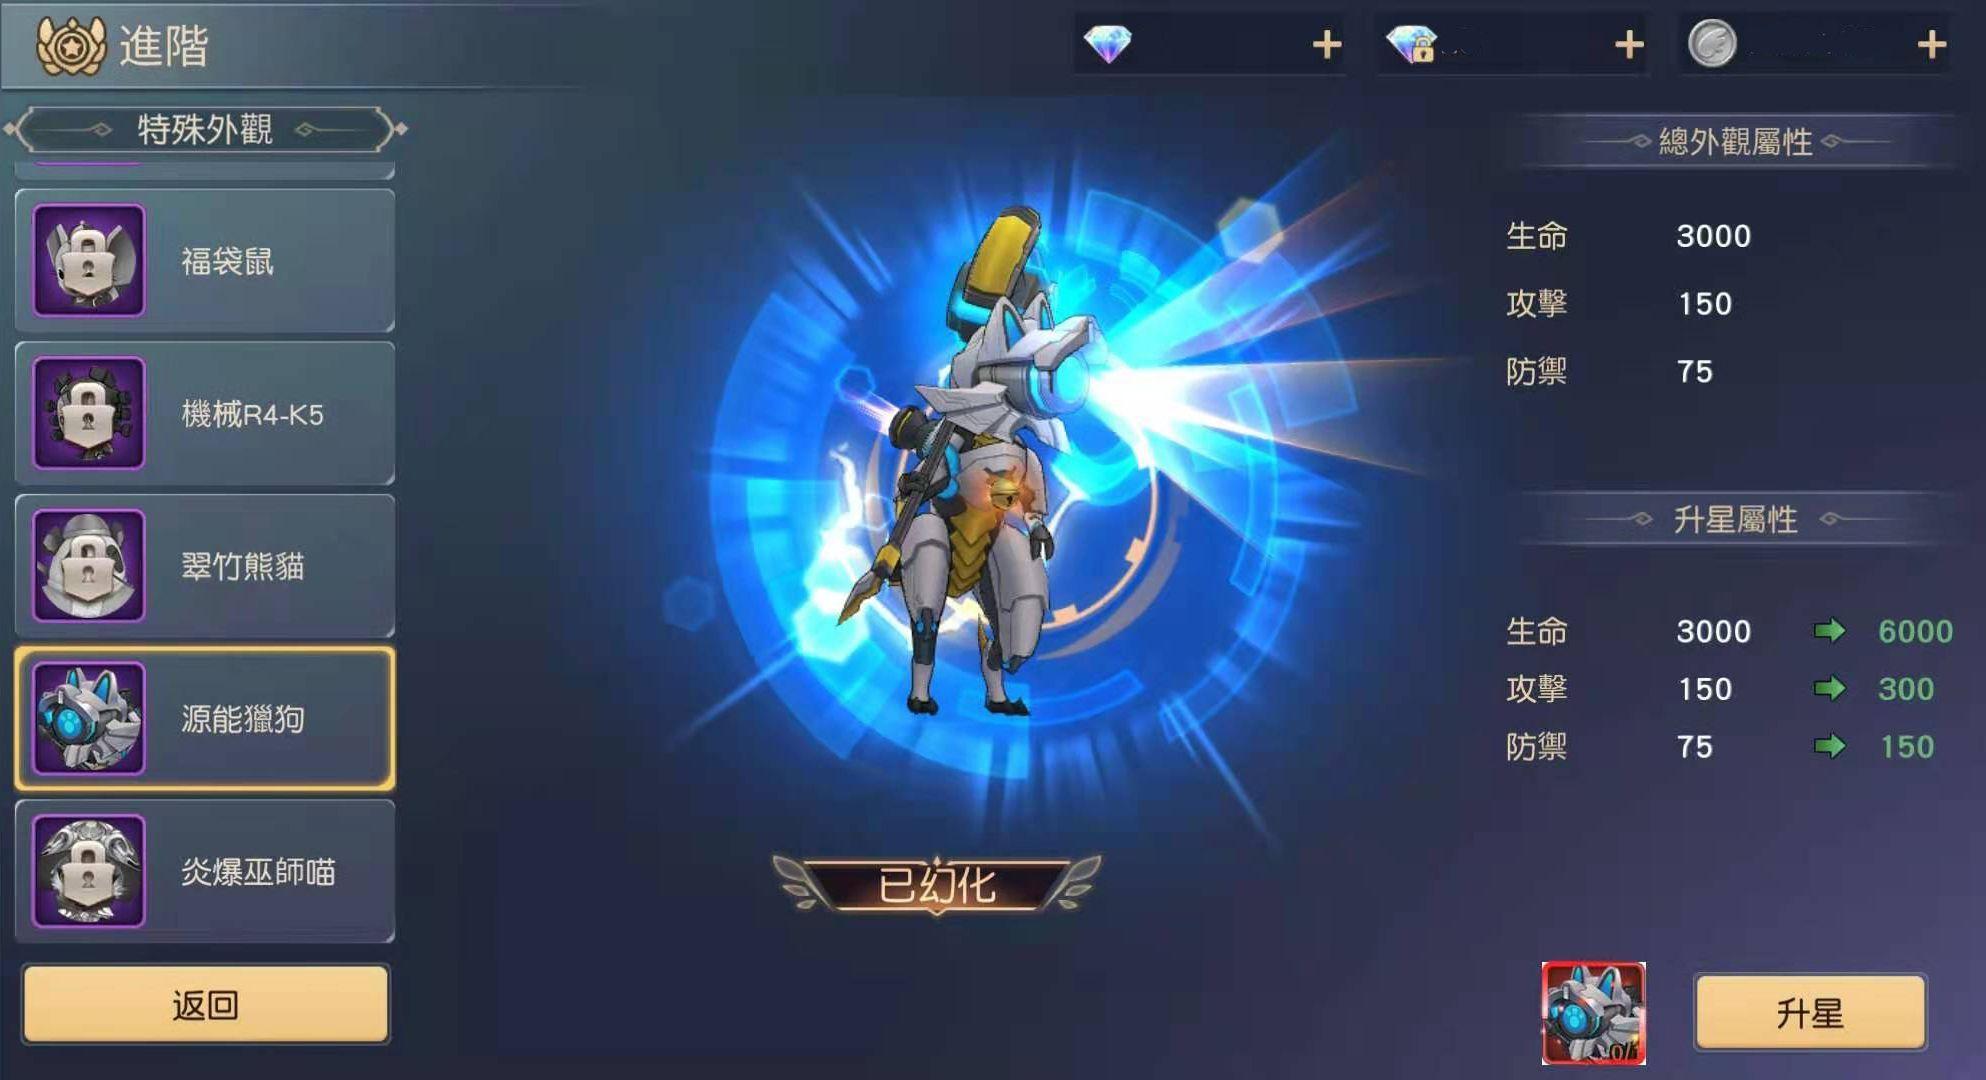 MMORPG《命運之輪》雙平台正式上線 多項慶祝活動同步開啟